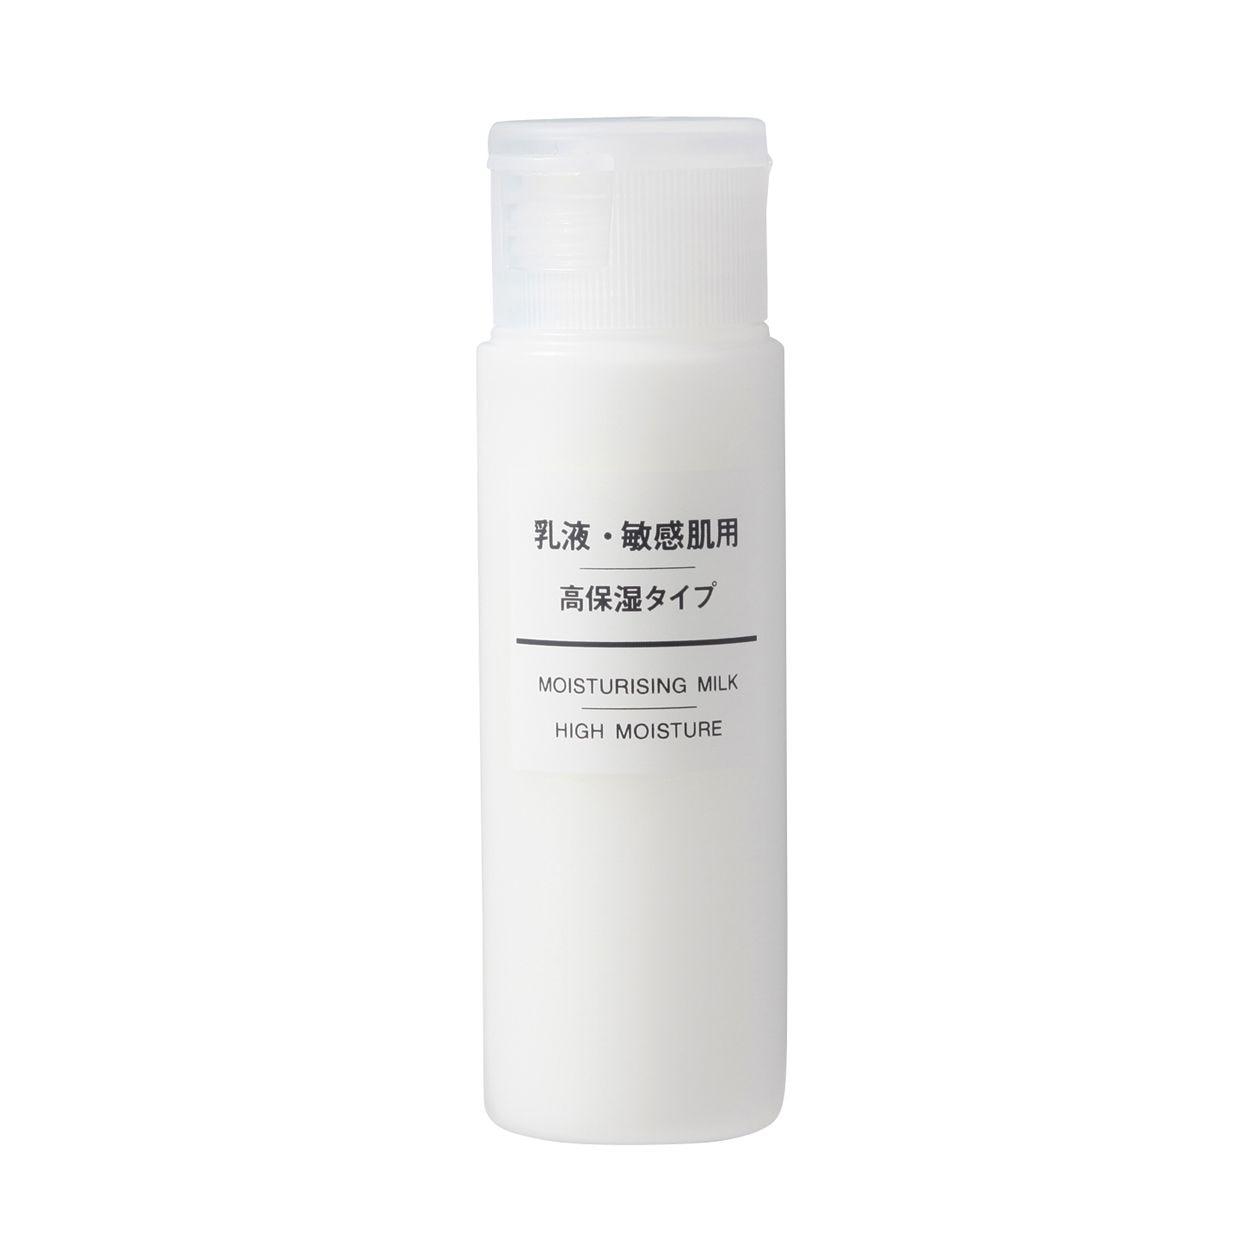 乳液・敏感肌用・高保湿タイプ(携帯用)